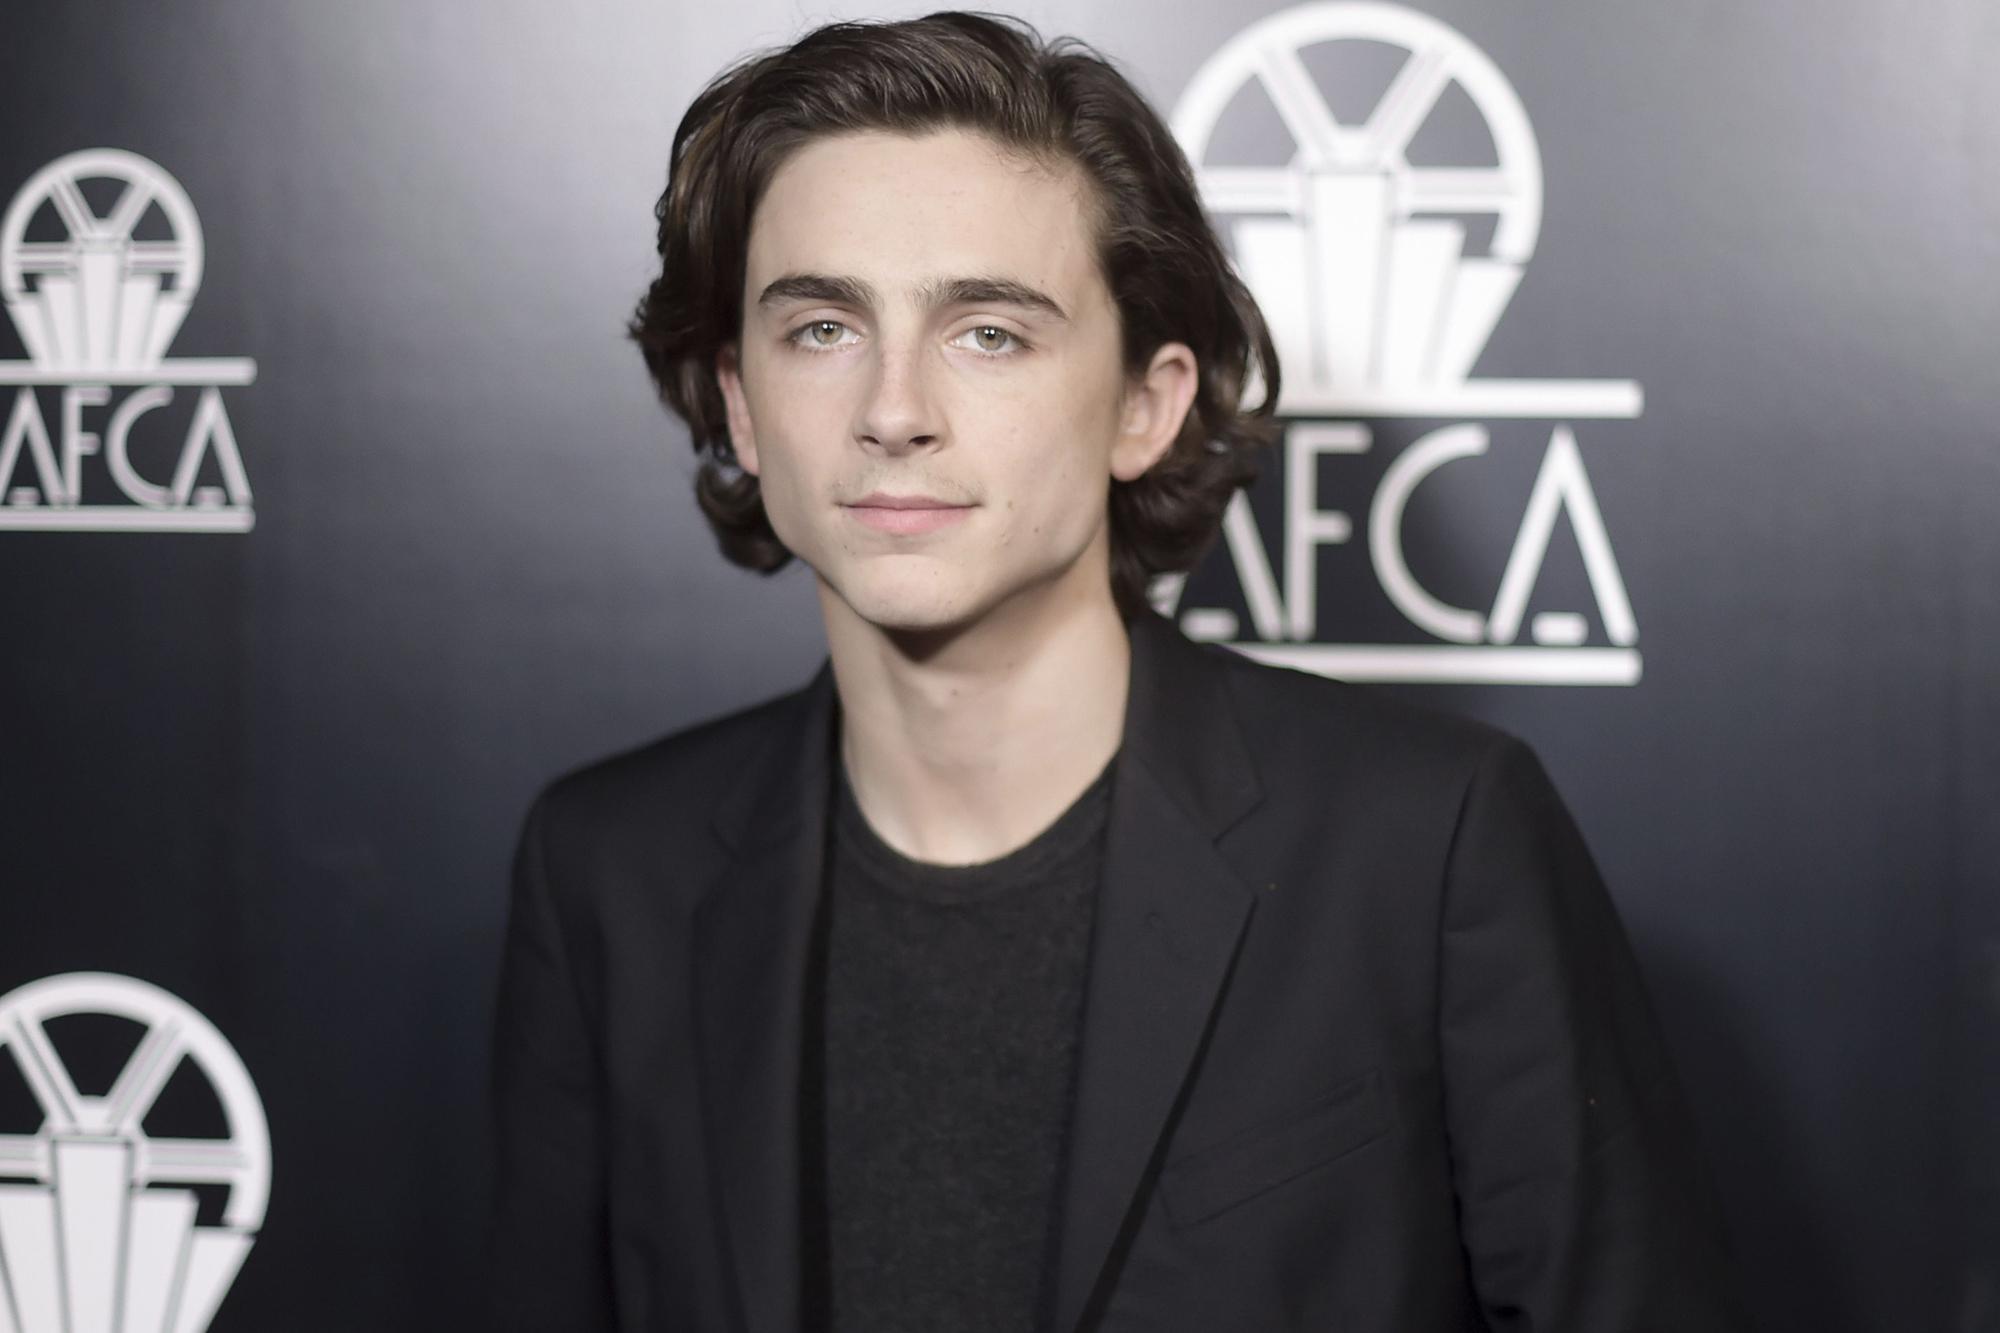 43rd Annual Film Critics Association Awards, Los Angeles, USA - 13 Jan 2018